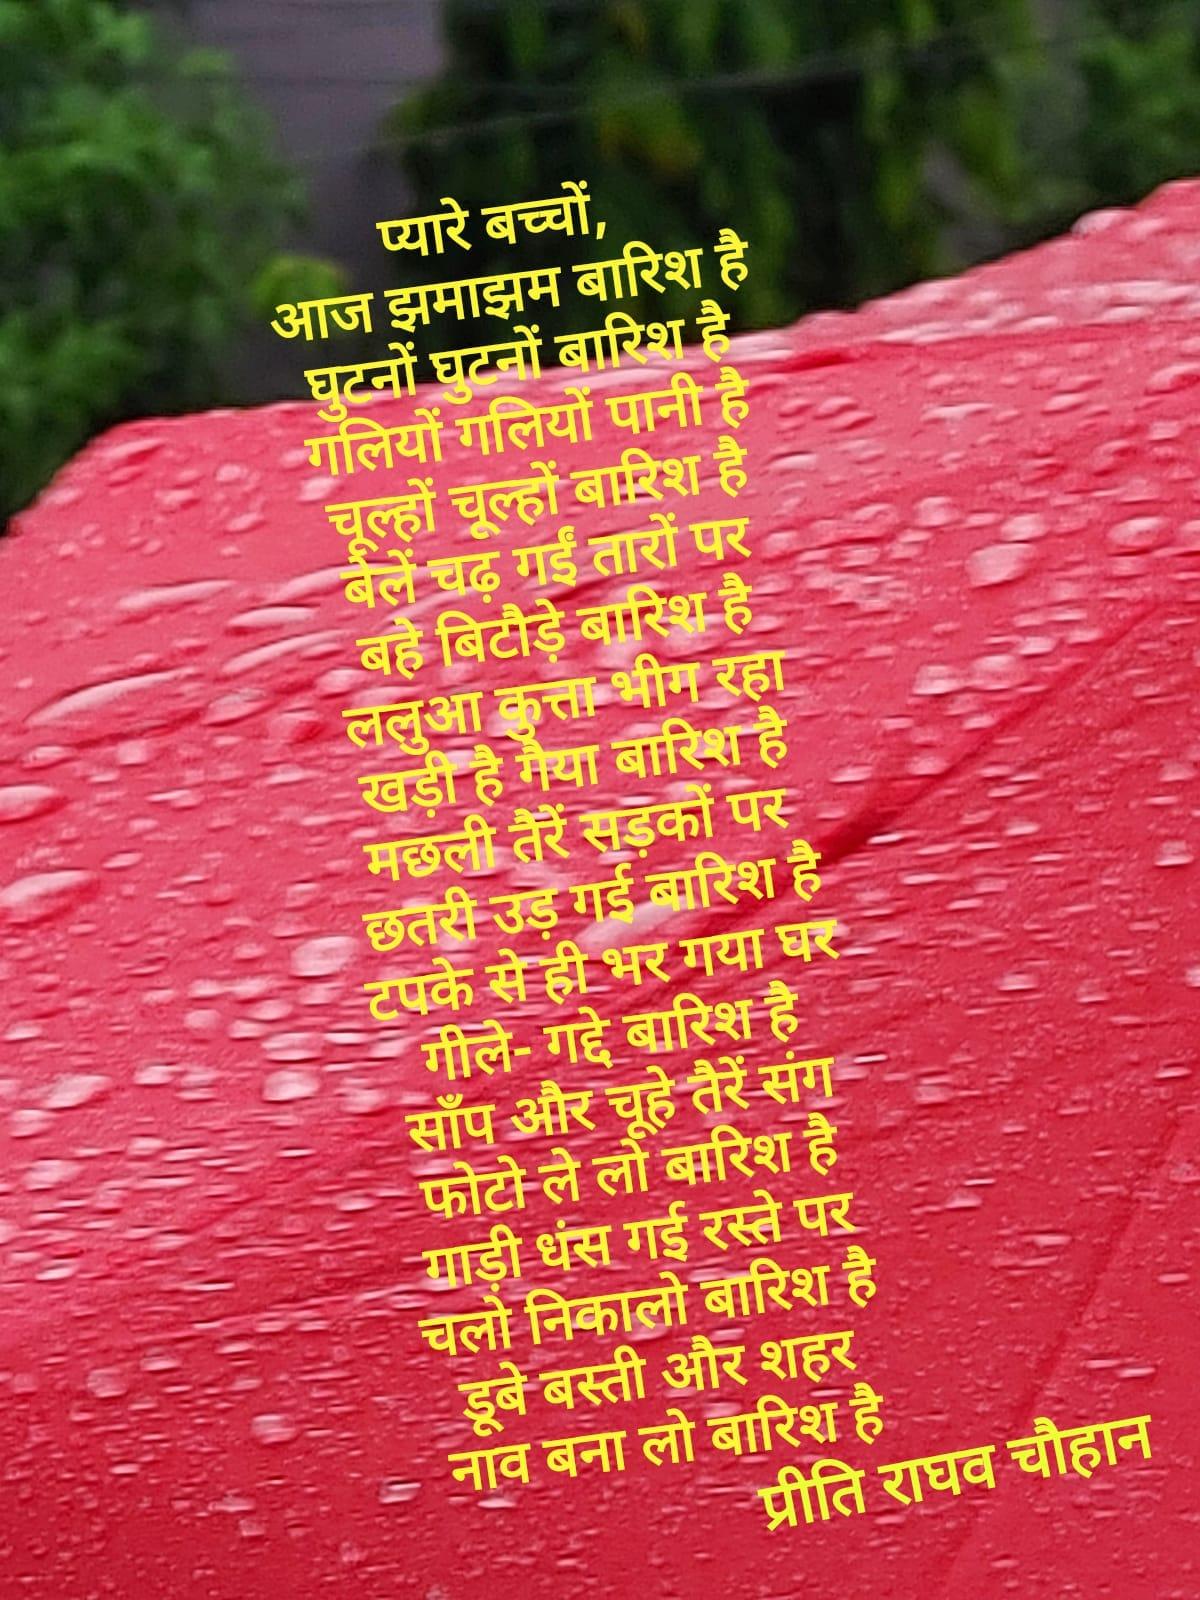 Photo by PritiRaghavChauhan